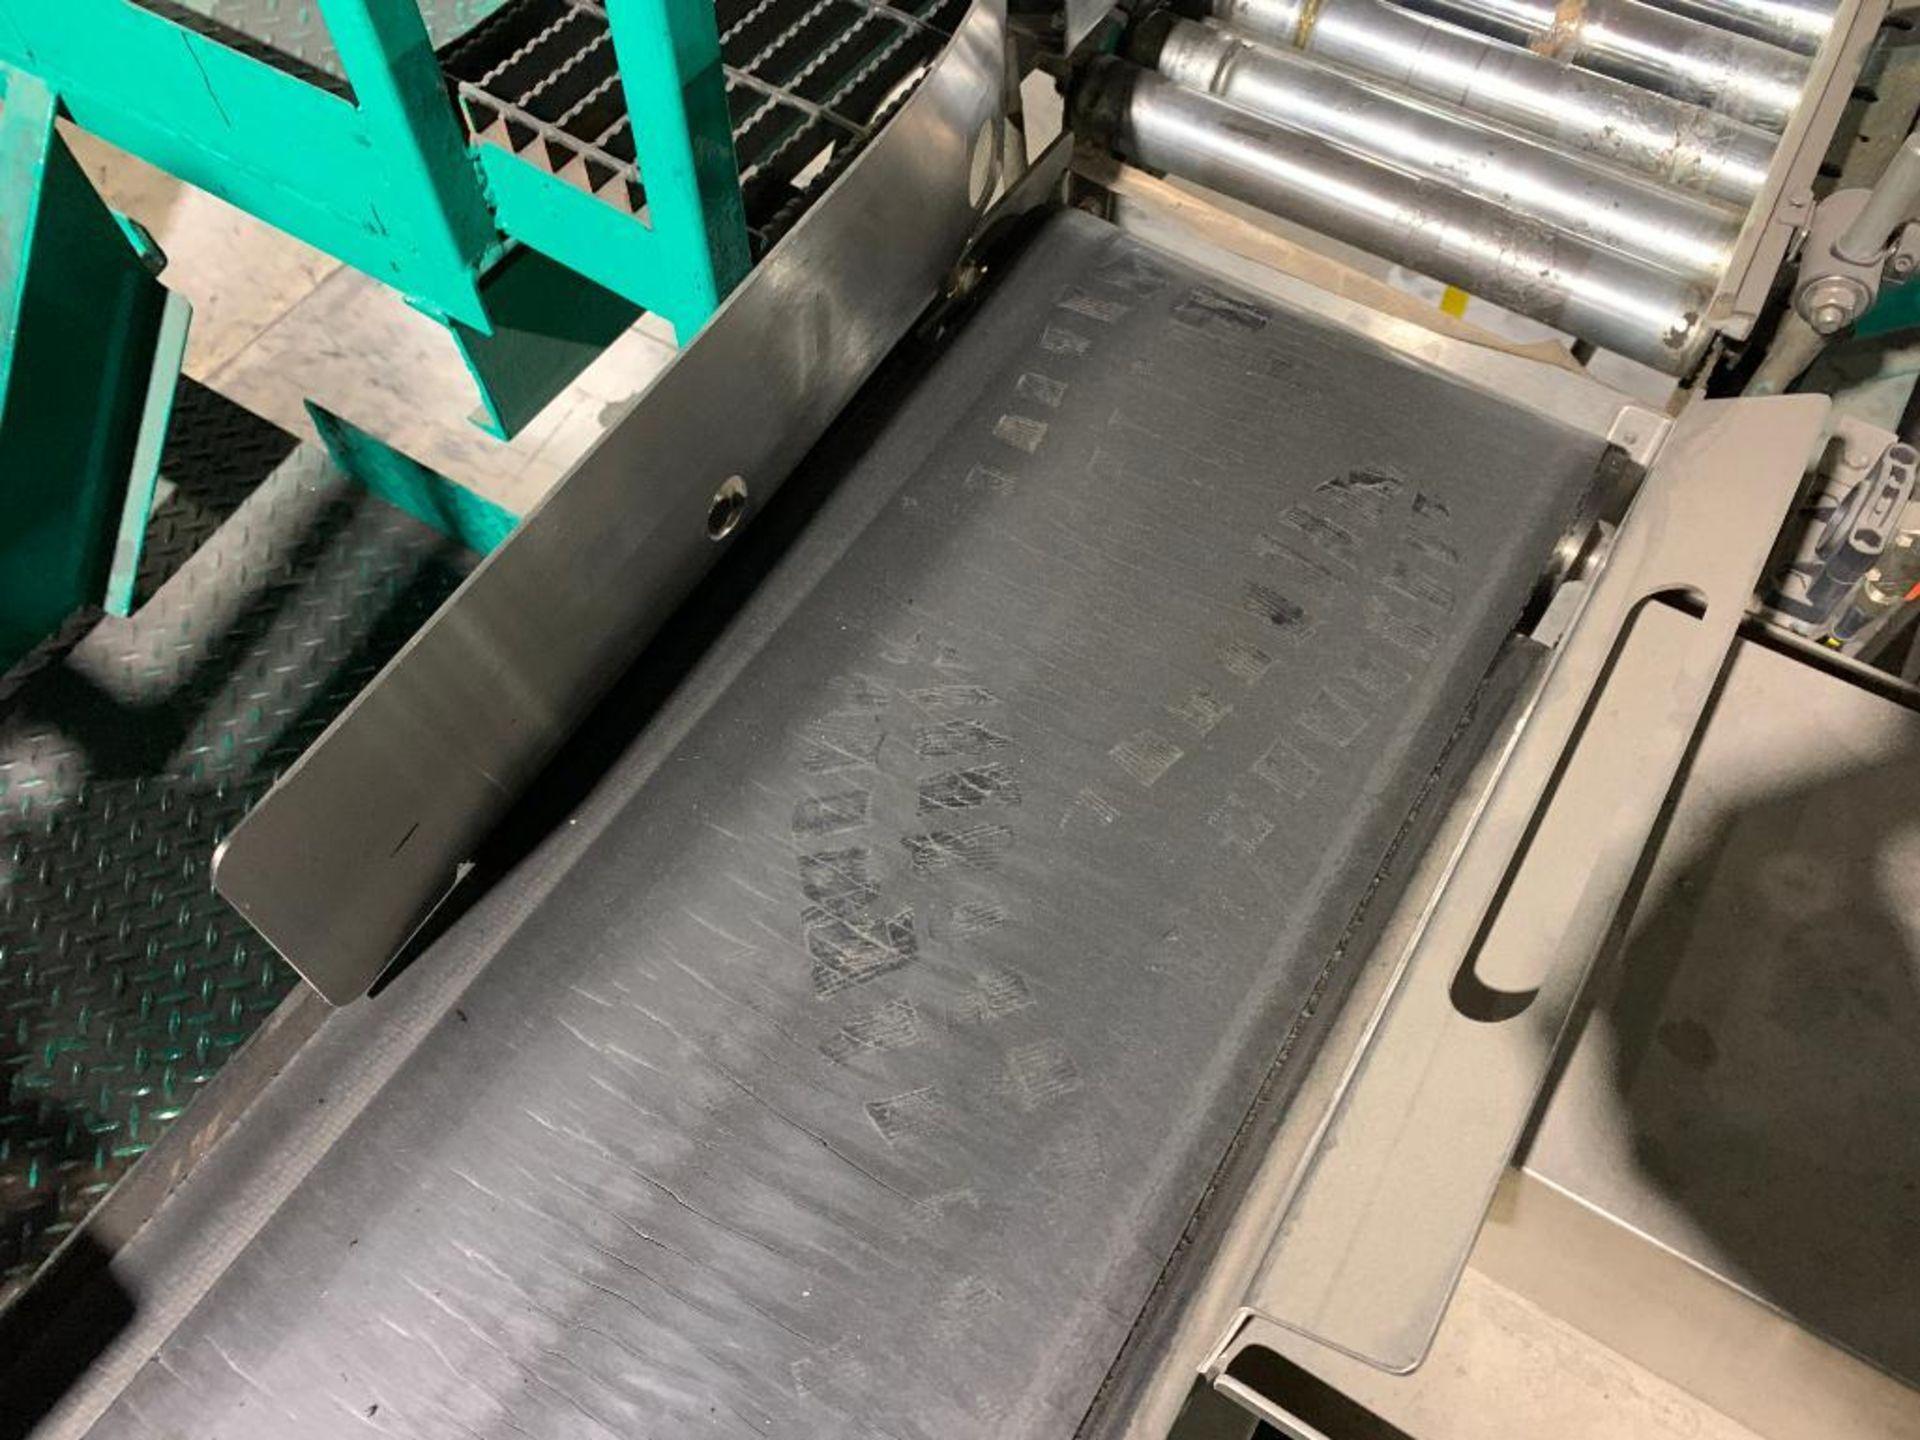 BMI stainless steel conveyor - Image 13 of 14